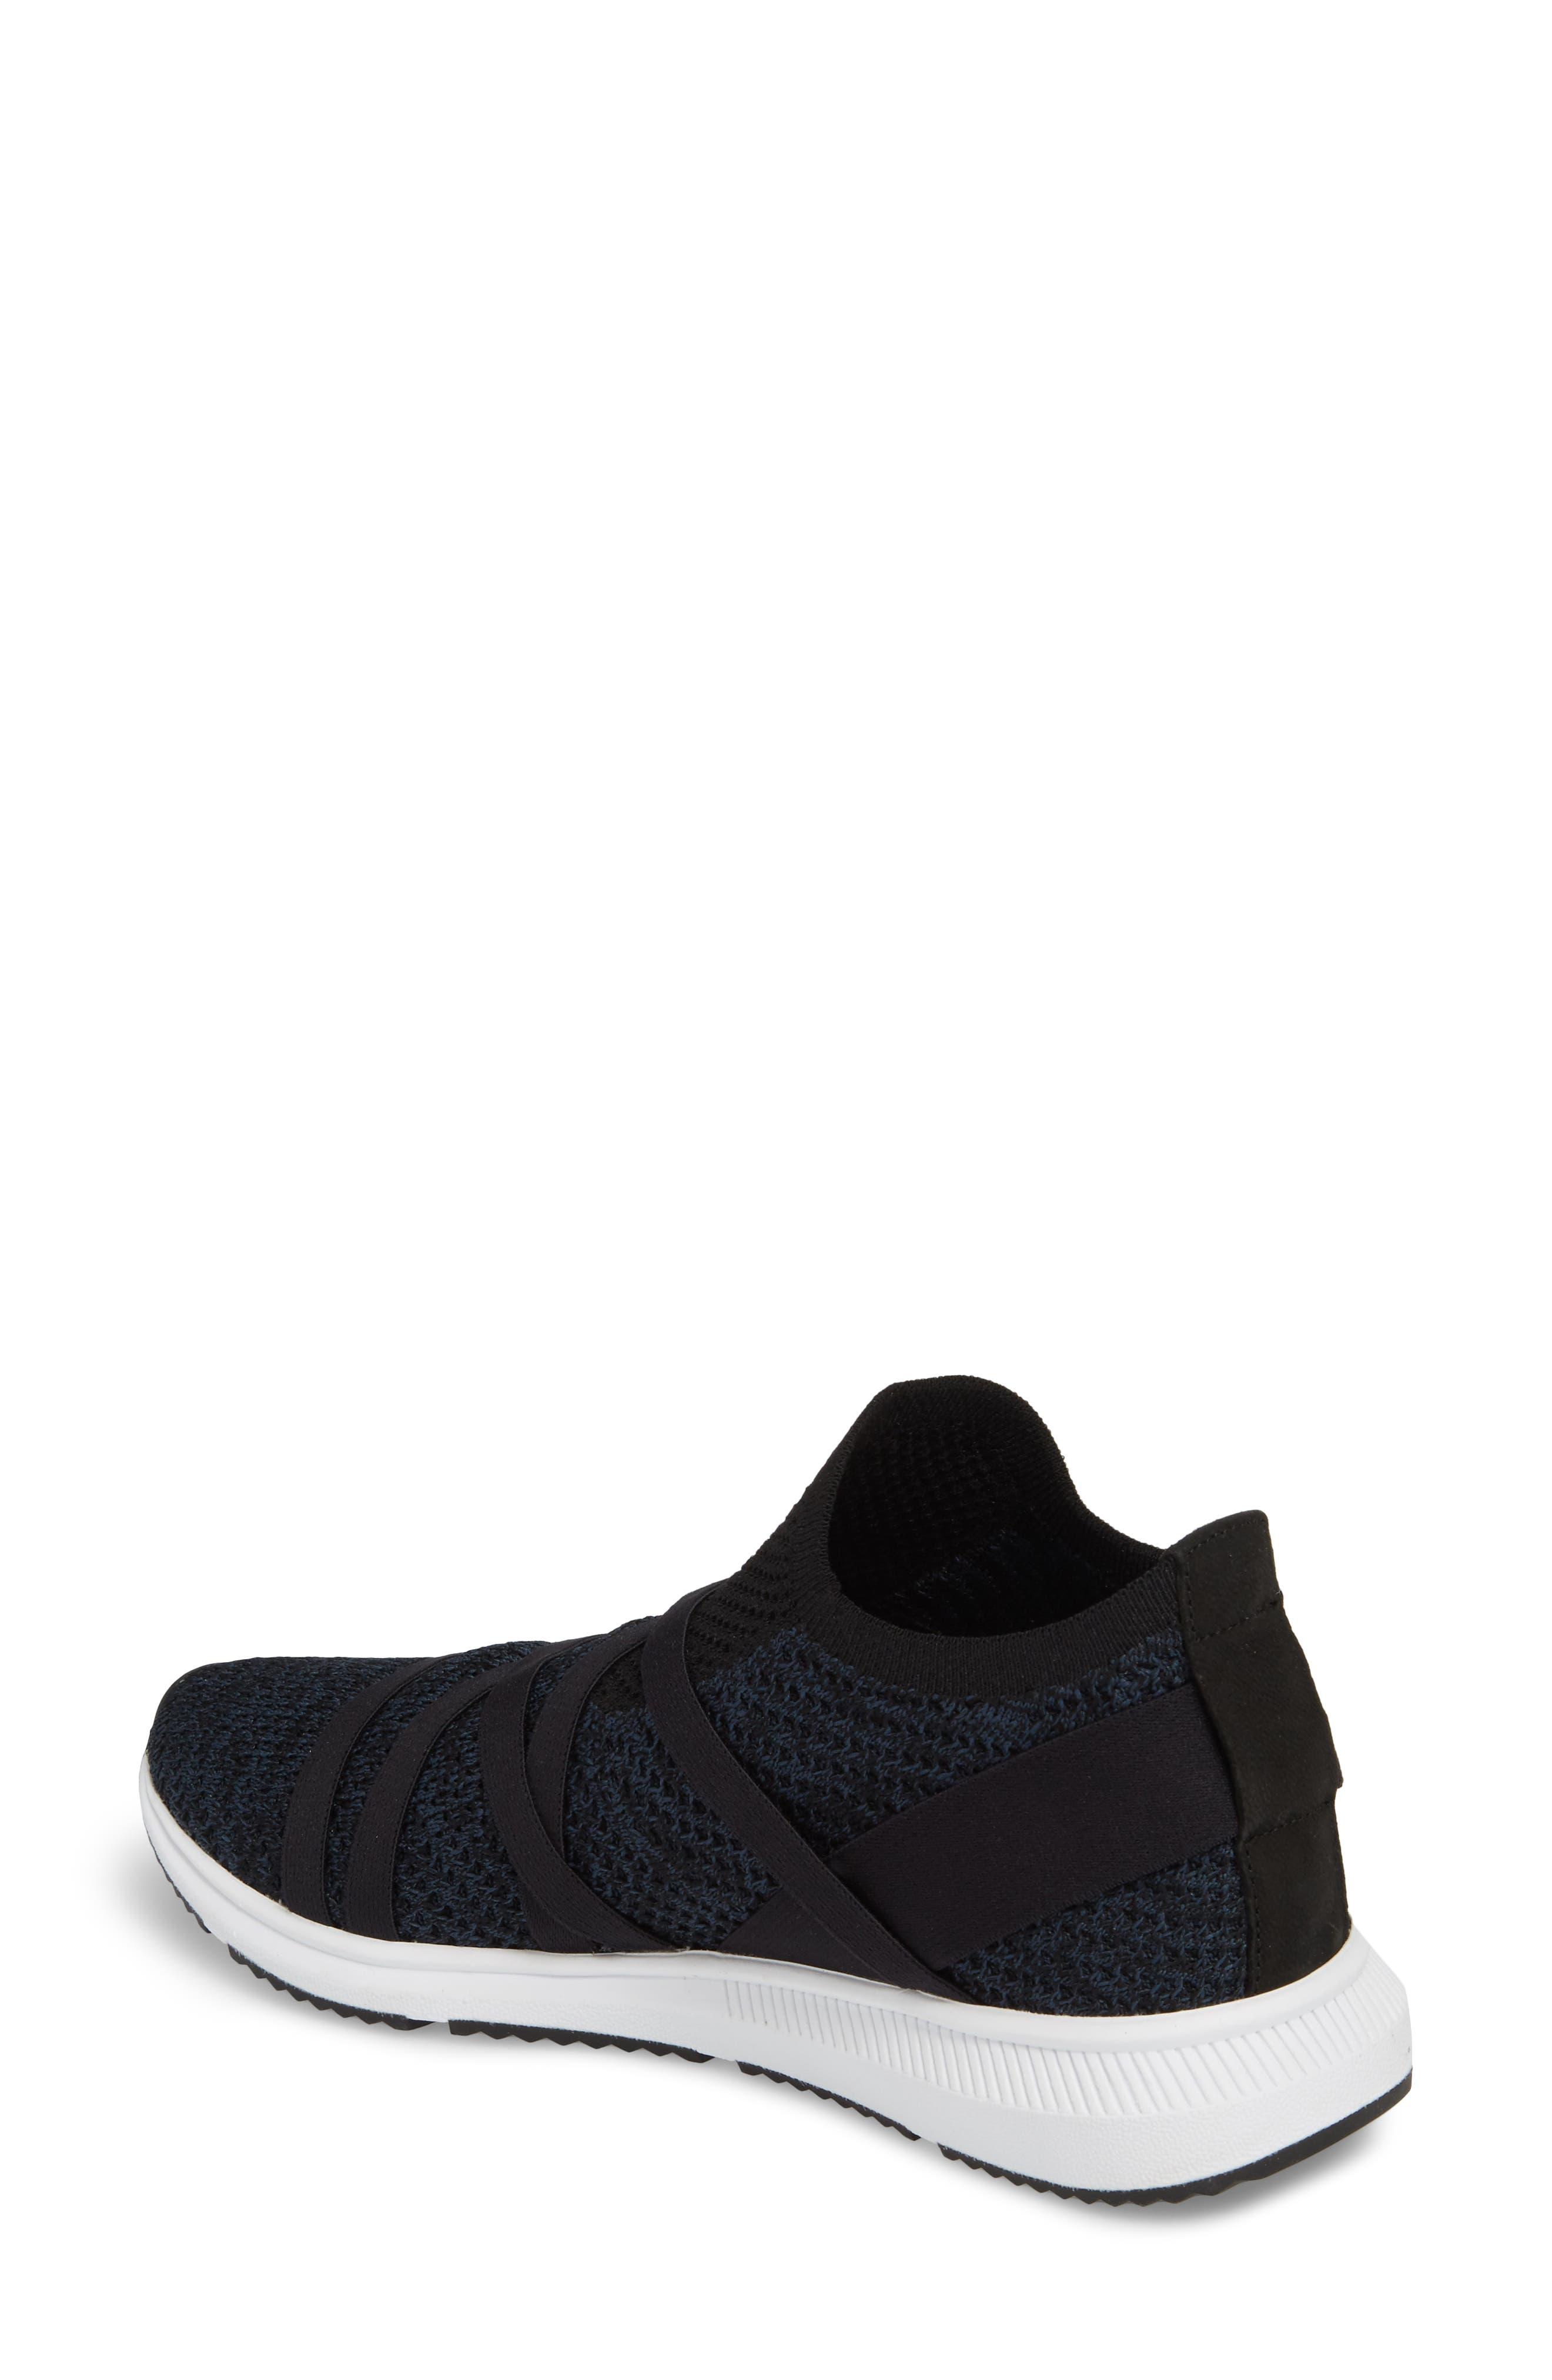 Xanady Woven Slip-On Sneaker,                             Alternate thumbnail 2, color,                             Black/ Marine Stretch